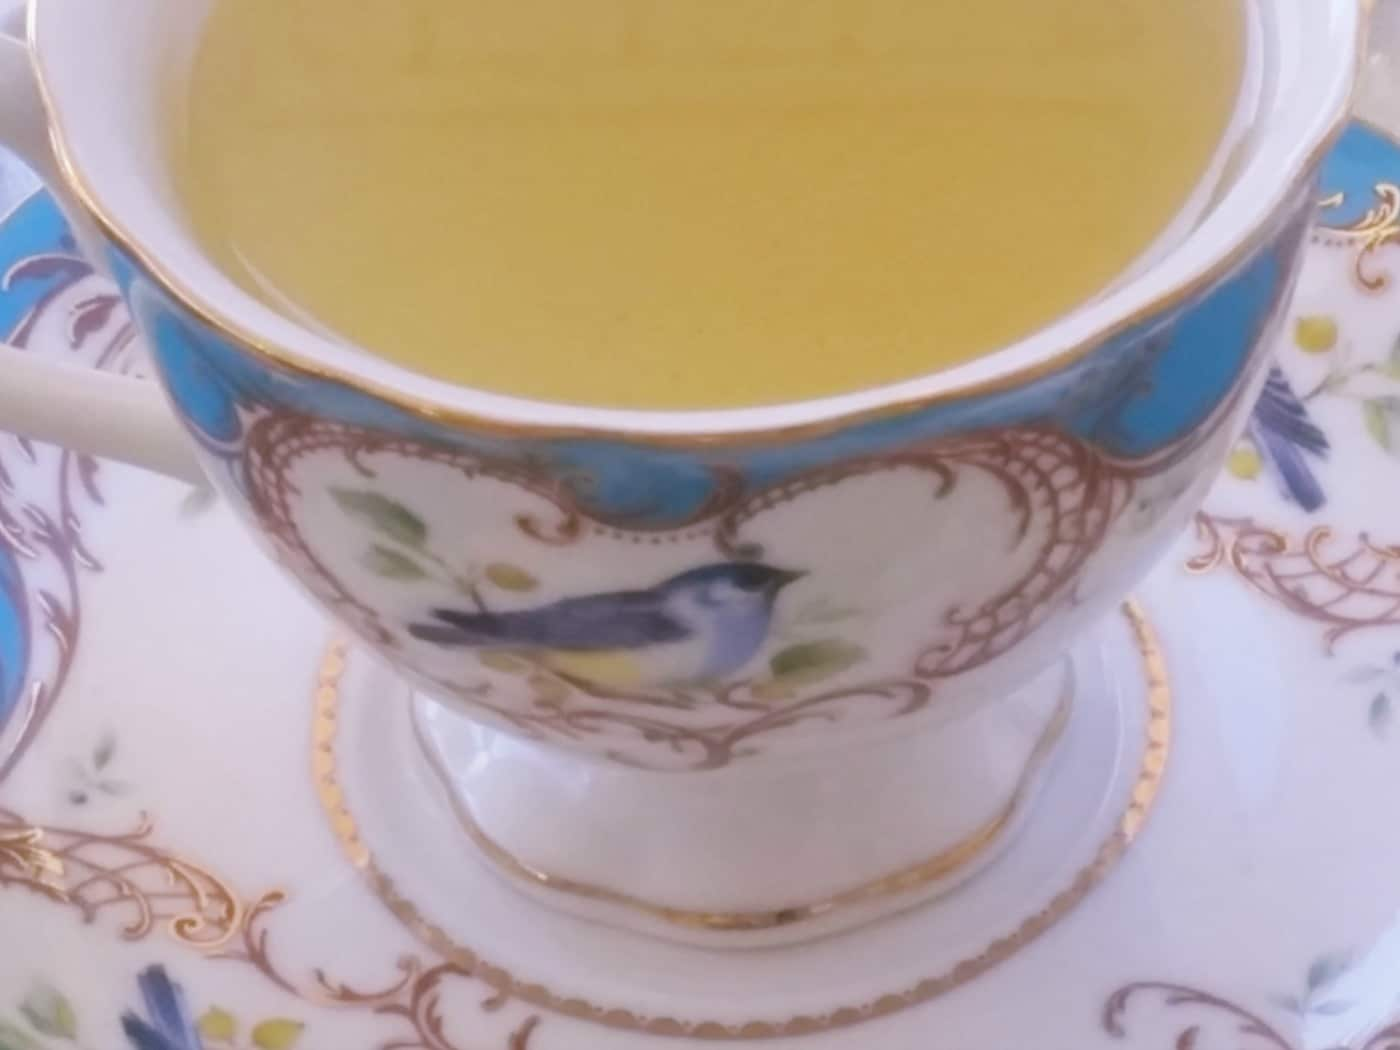 enjoy a cup of green tea!